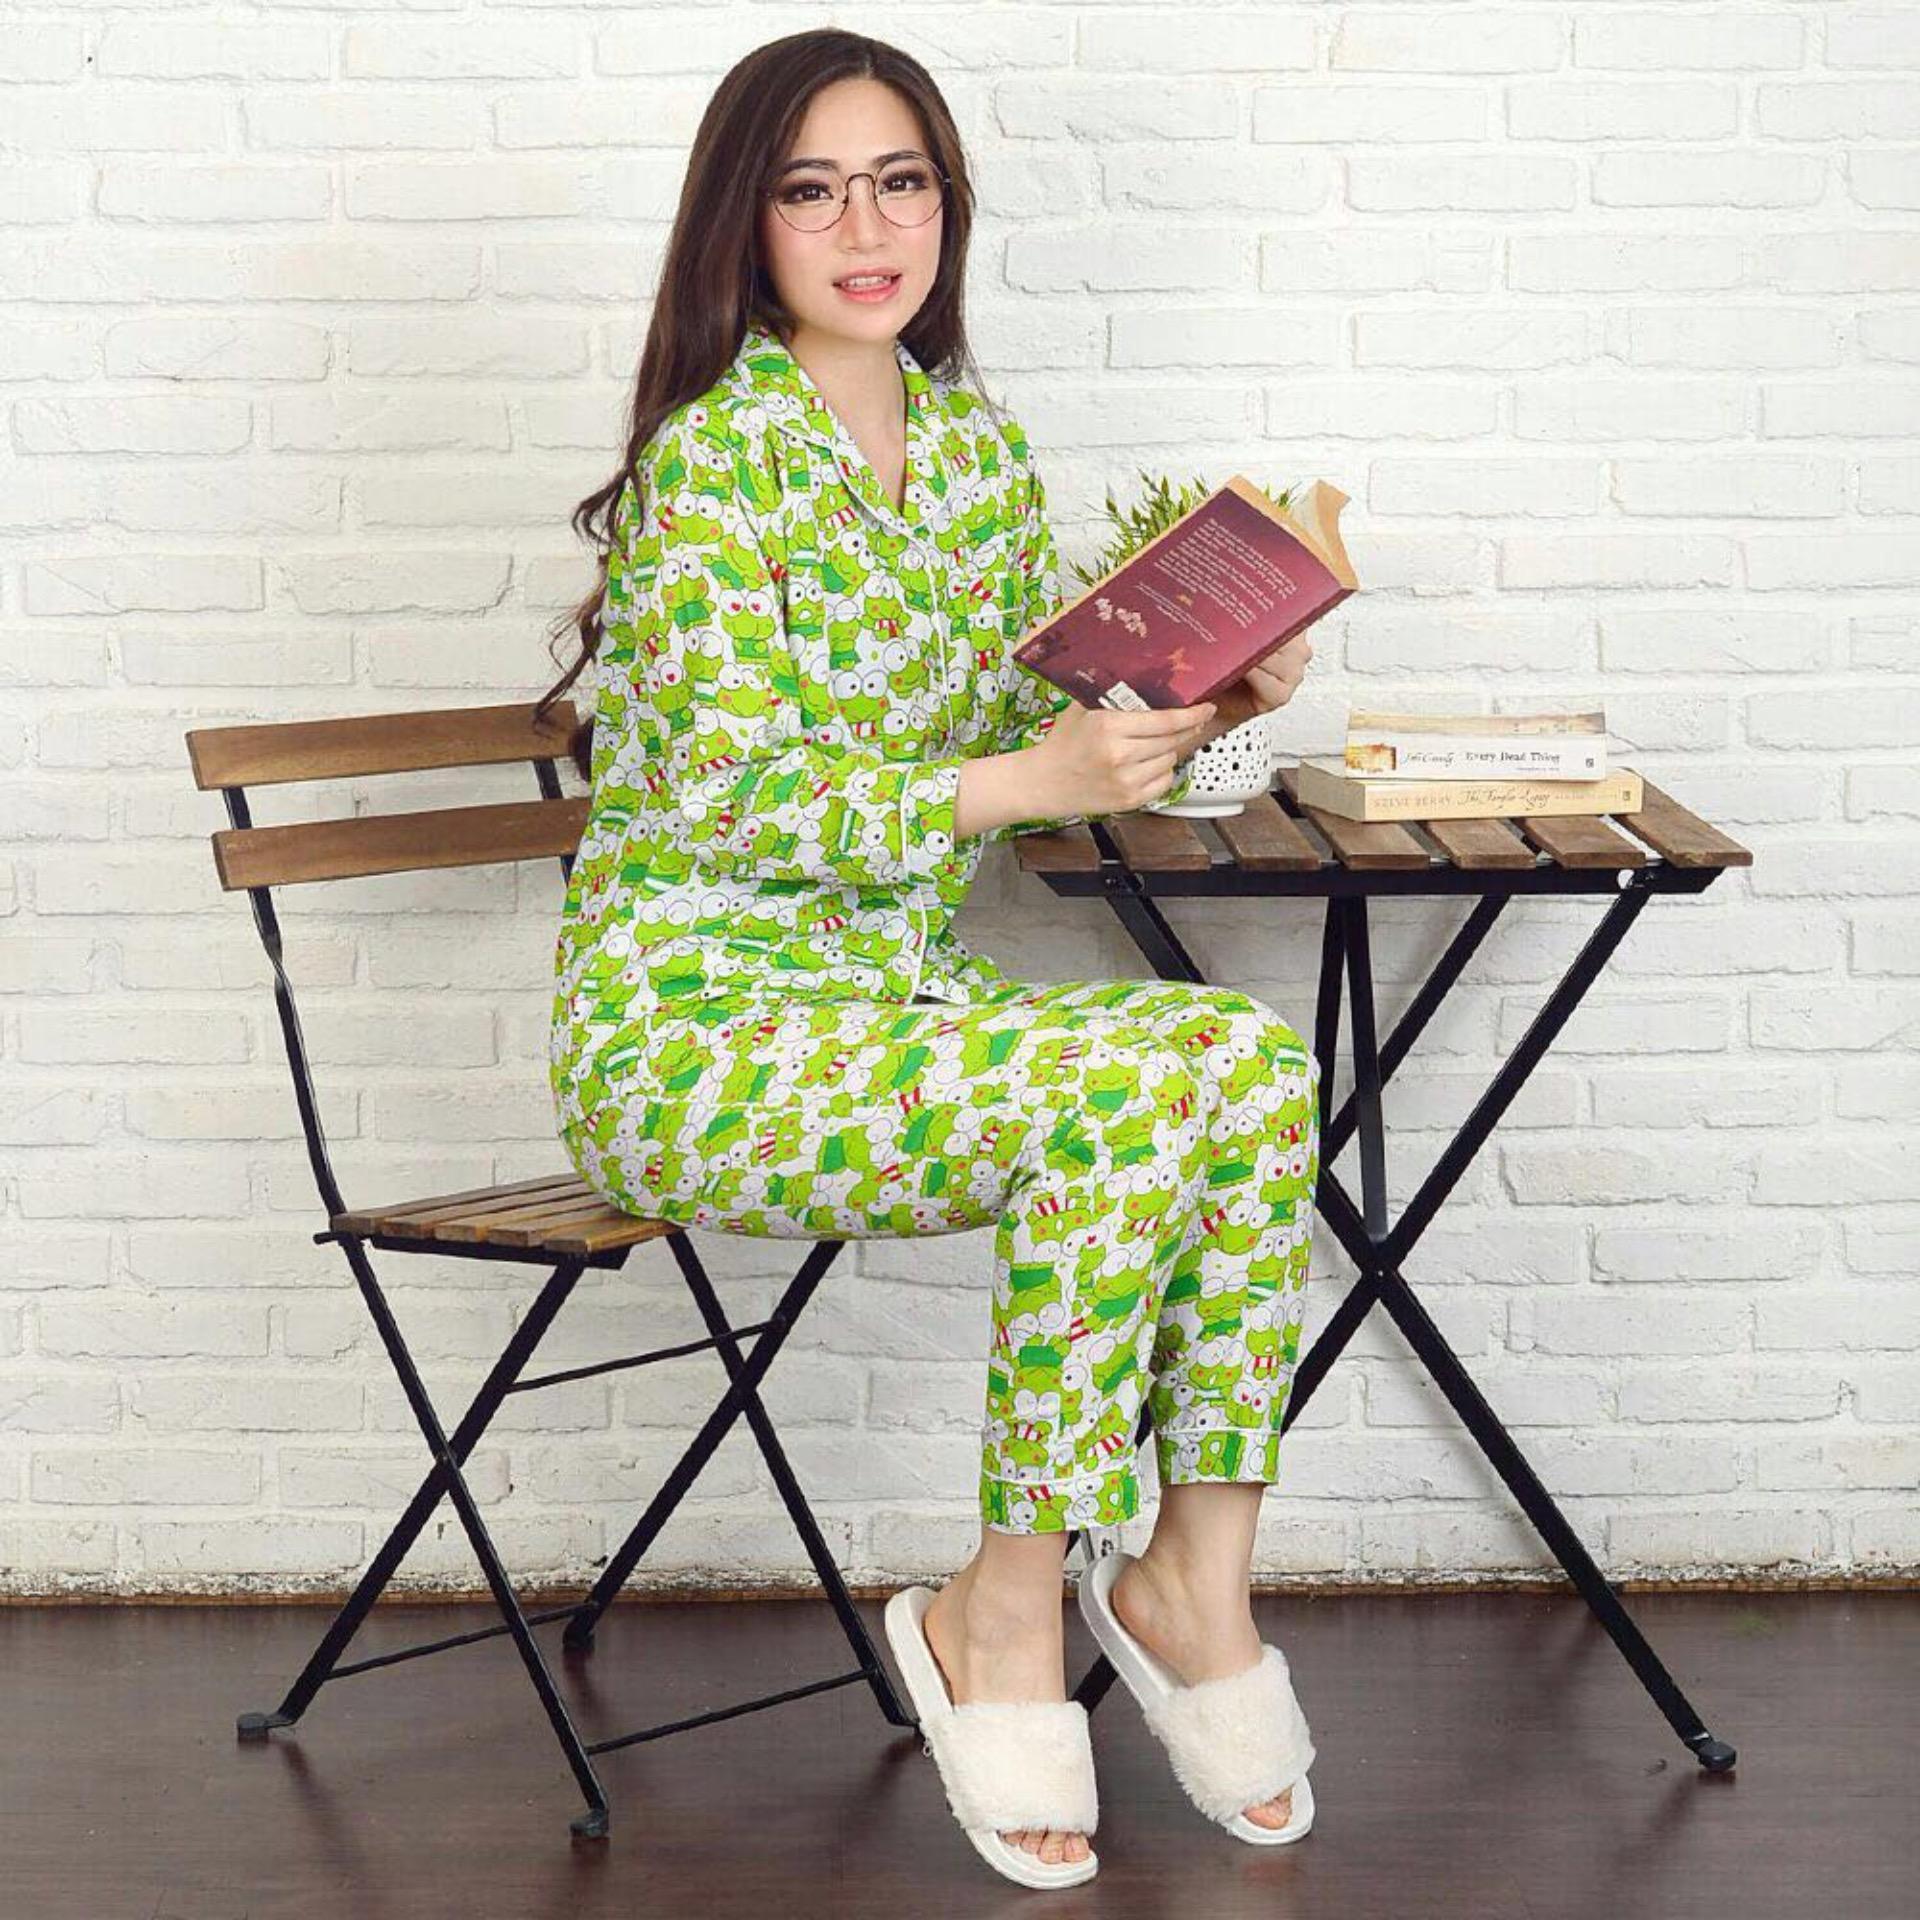 F Fashion Baju Tidur Wanita Piyama Wanita Keropi / Piyama Wanita / Baju Tidur Wanita /